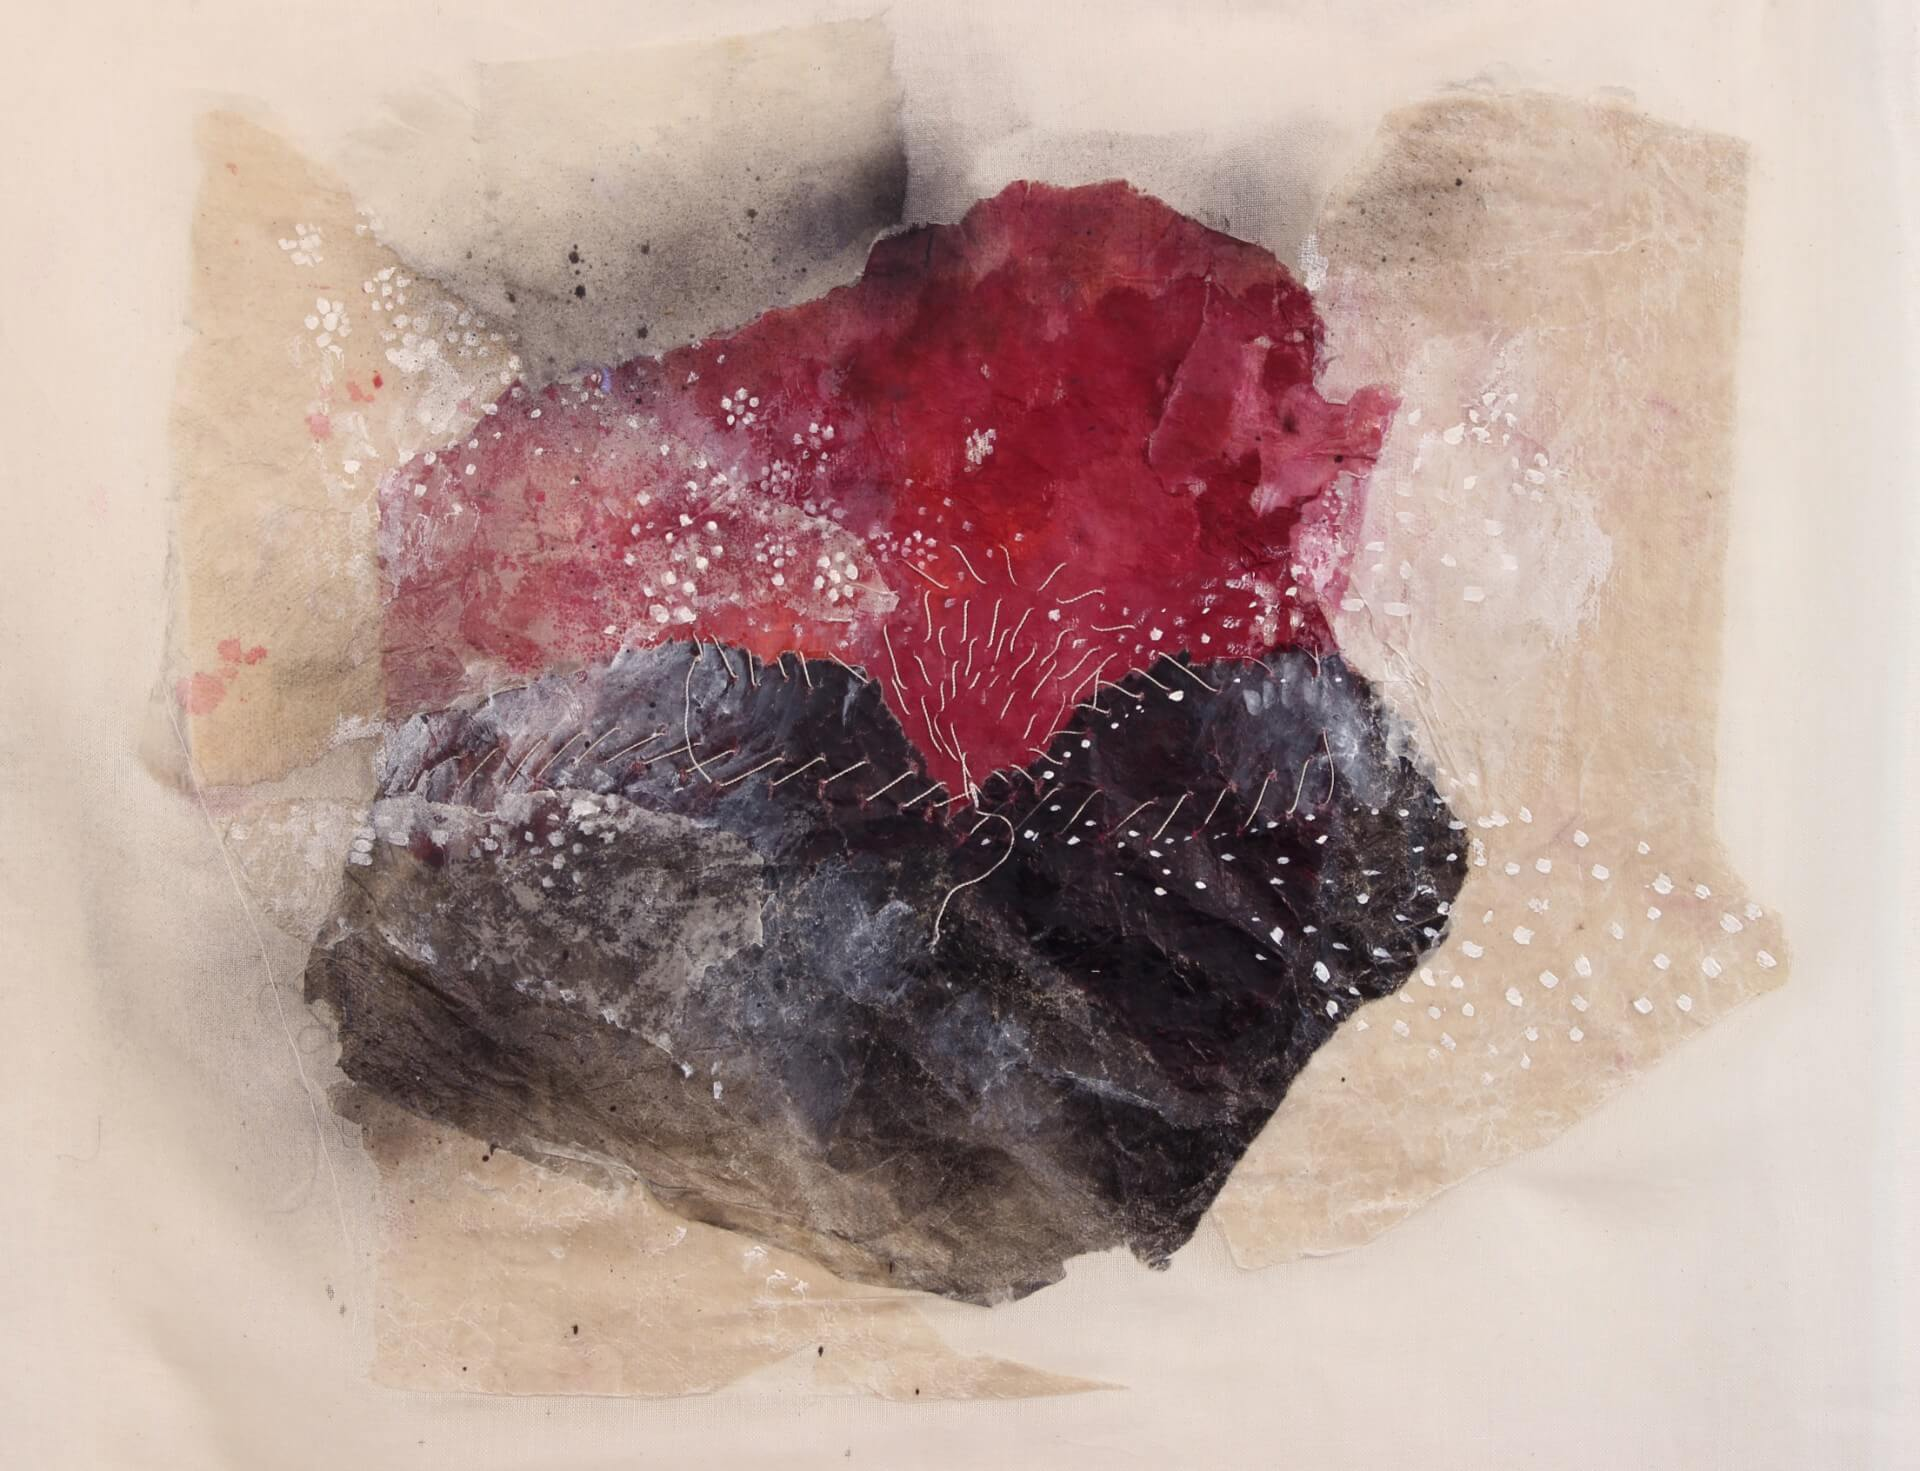 Heart - 2017